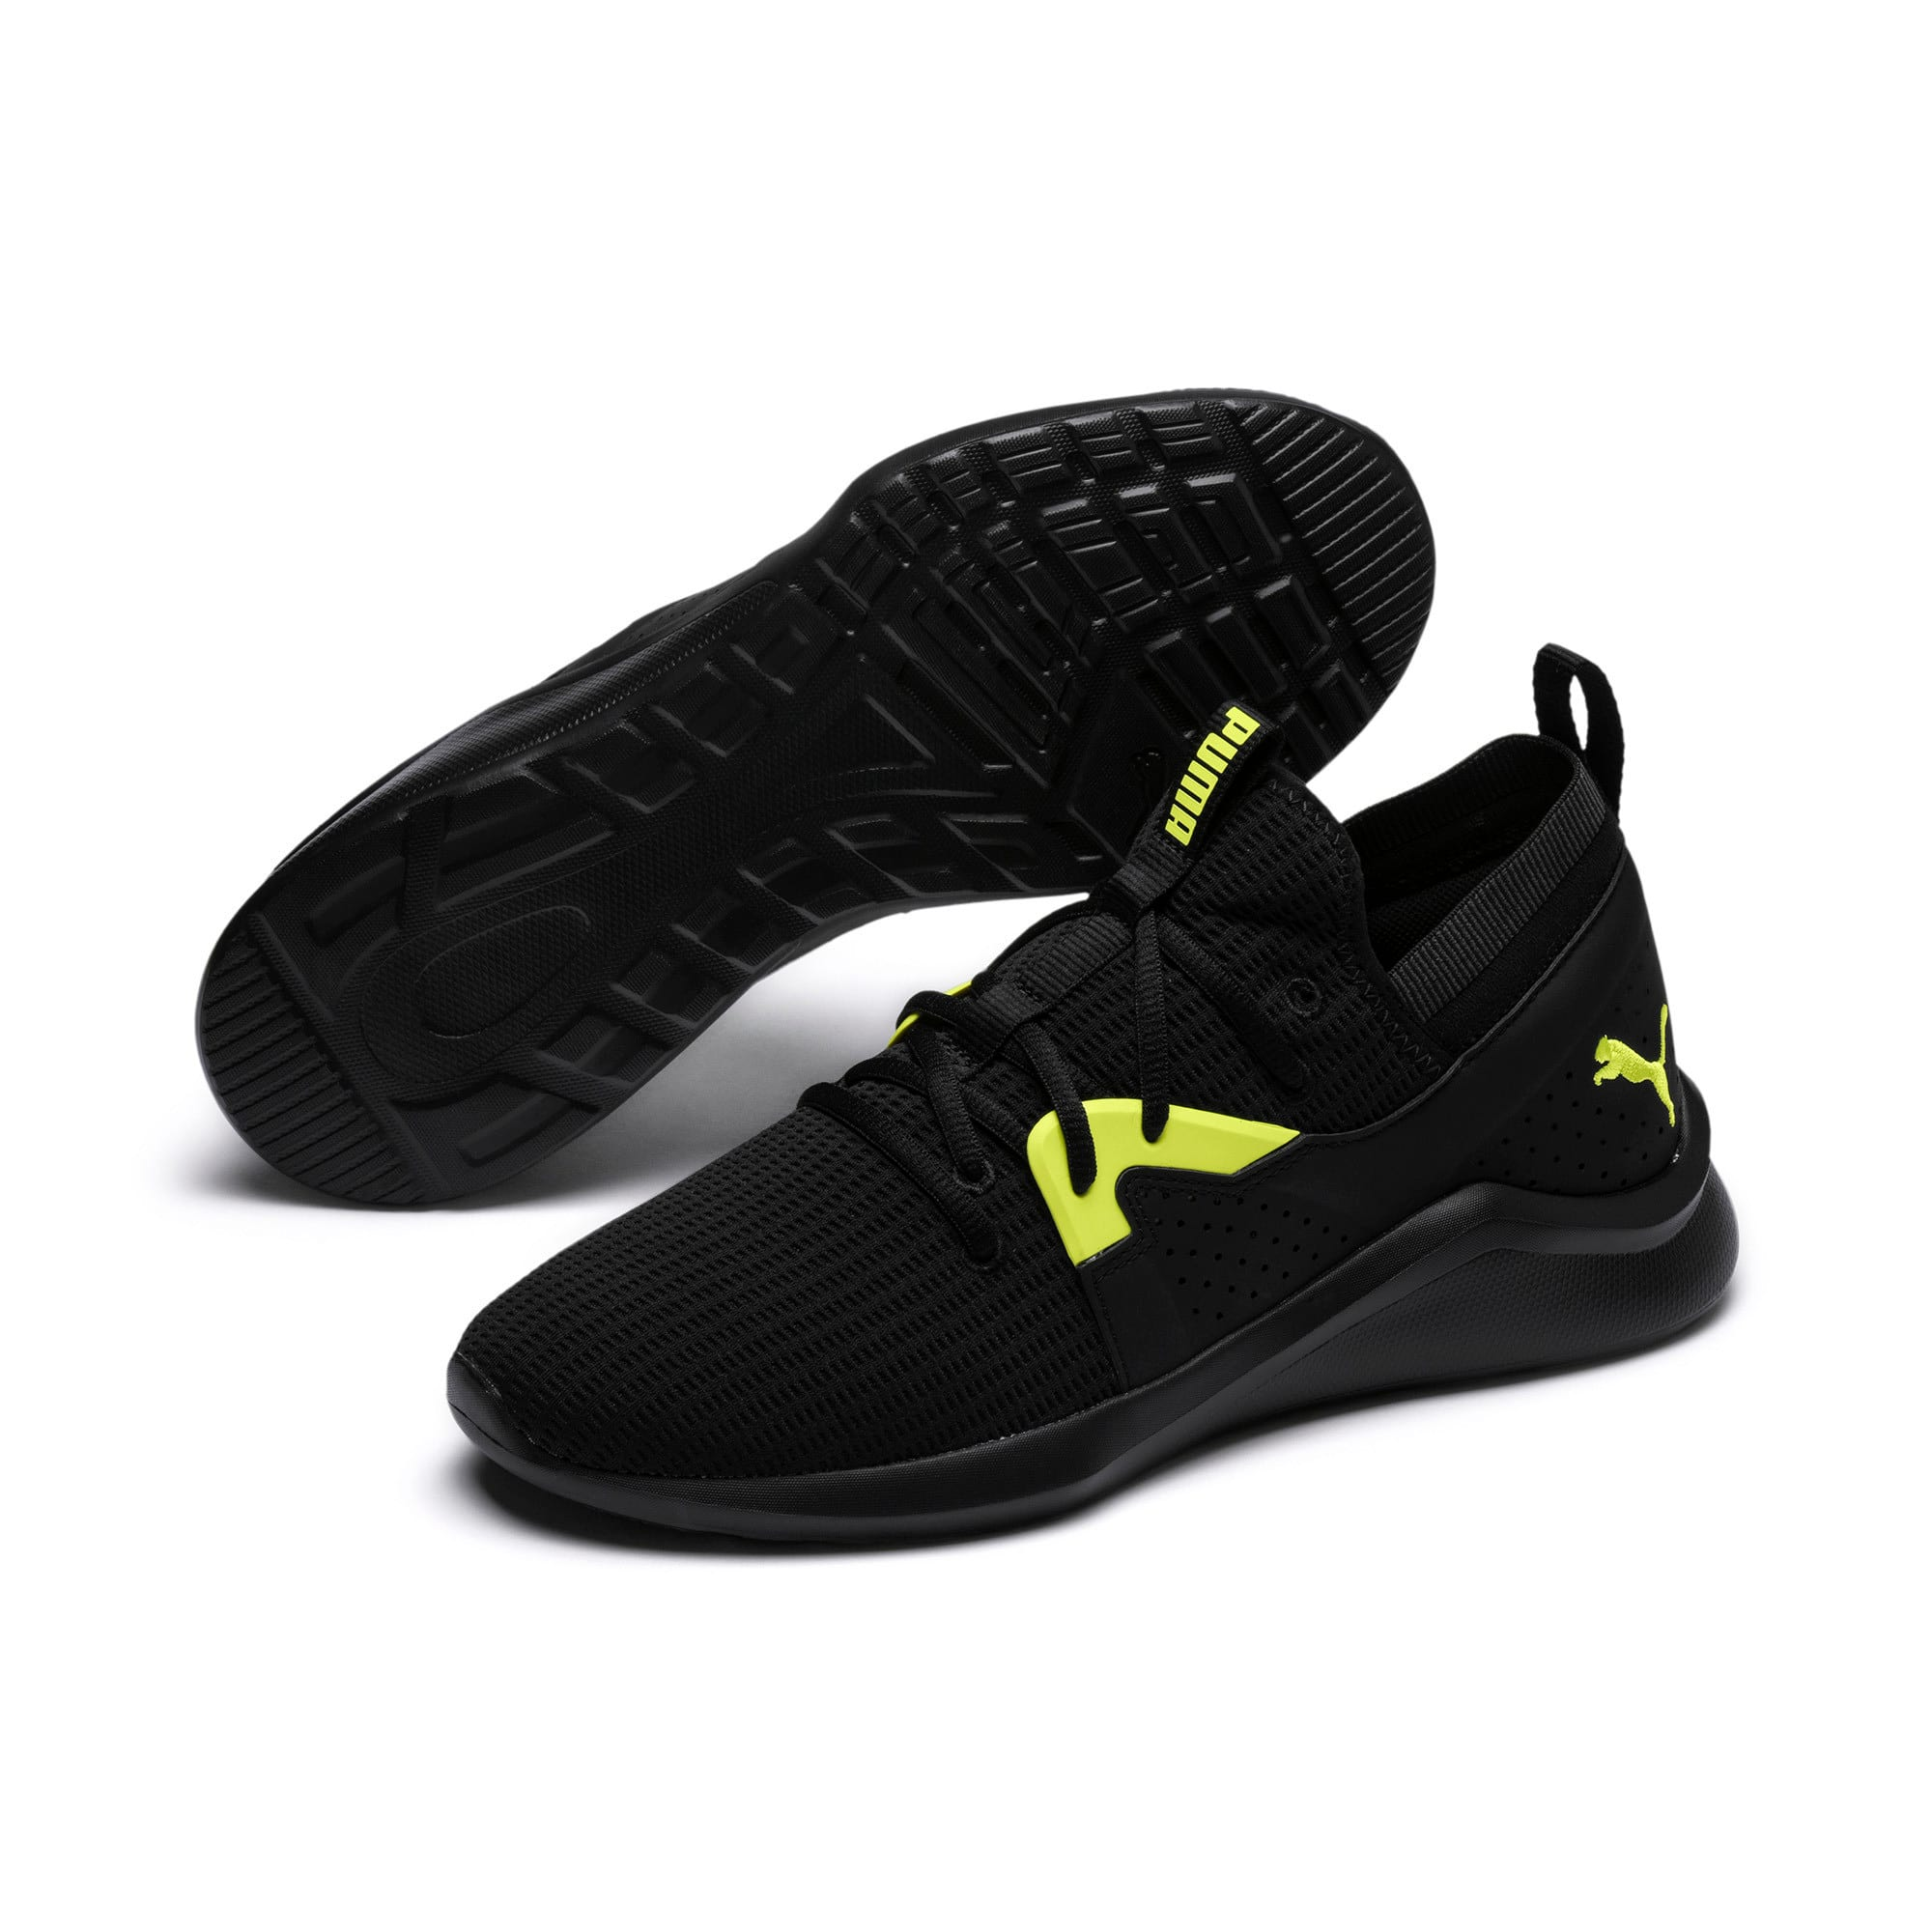 Thumbnail 2 of Emergence Future Men's Training Shoes, Black-Charcoal-Yellow, medium